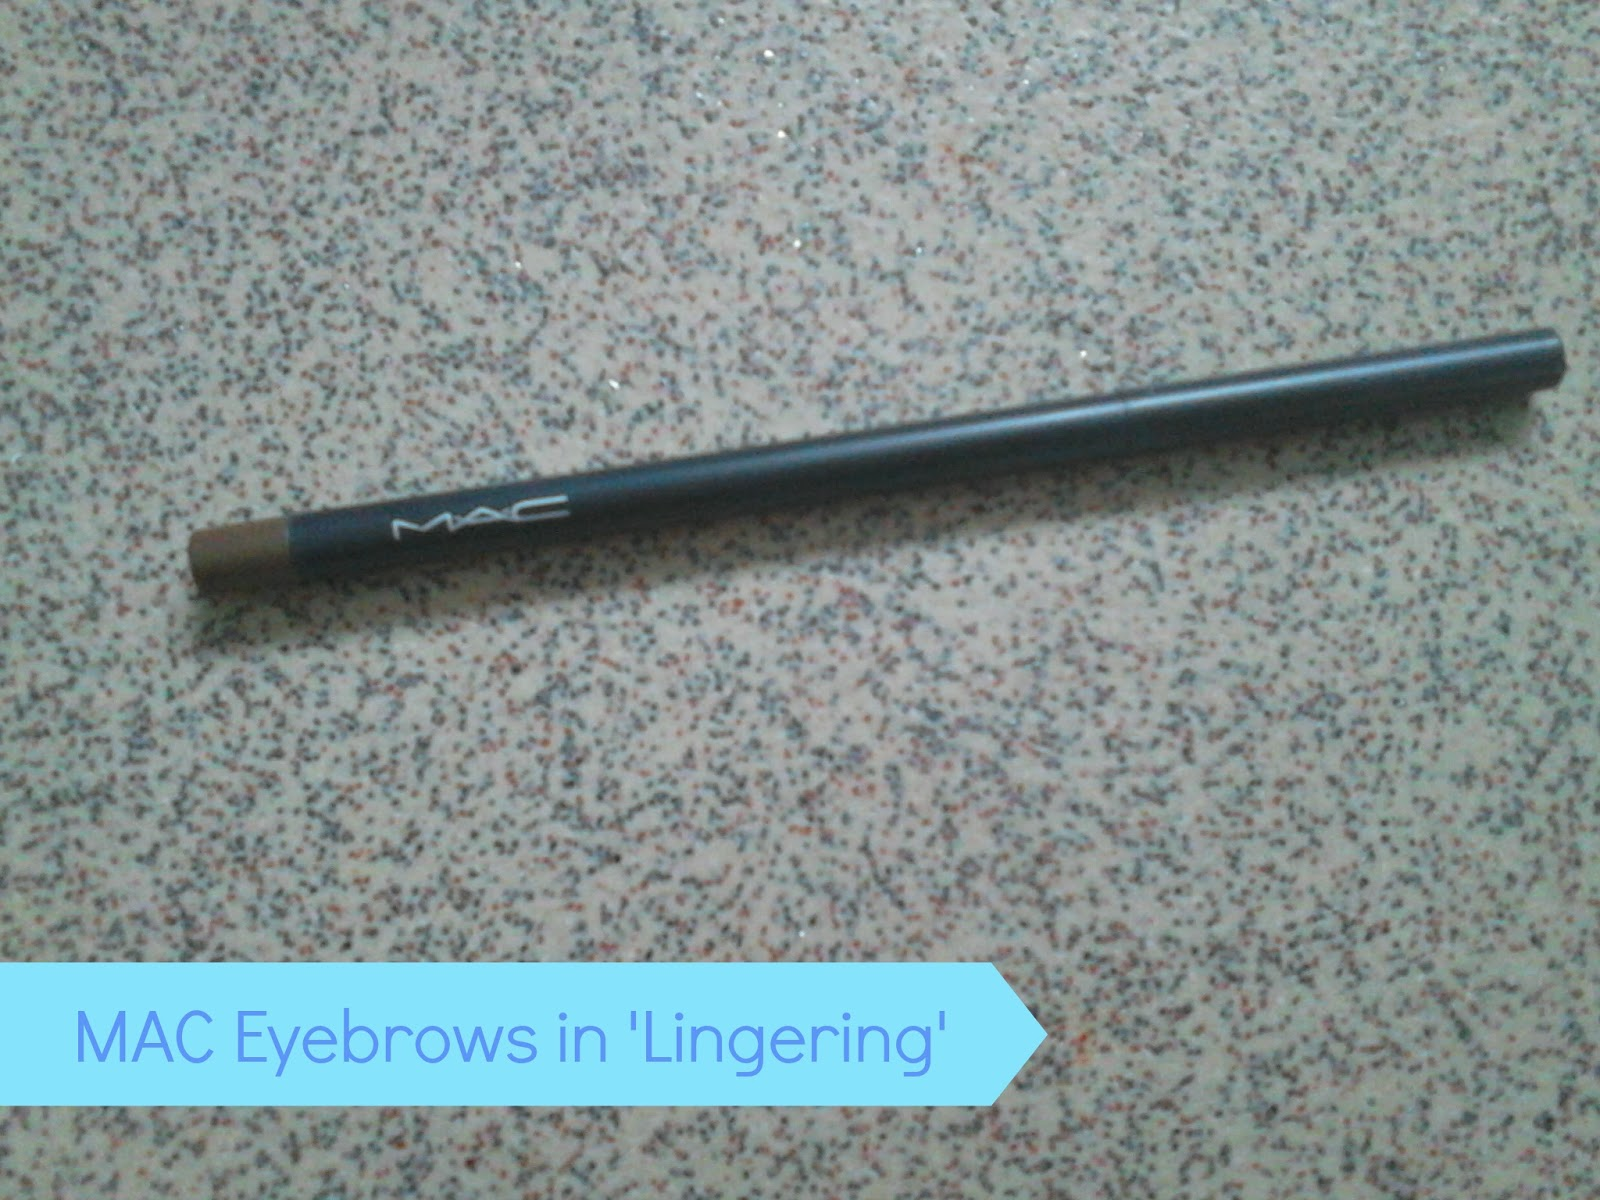 MAC Eyebrow Pencil in Lingering